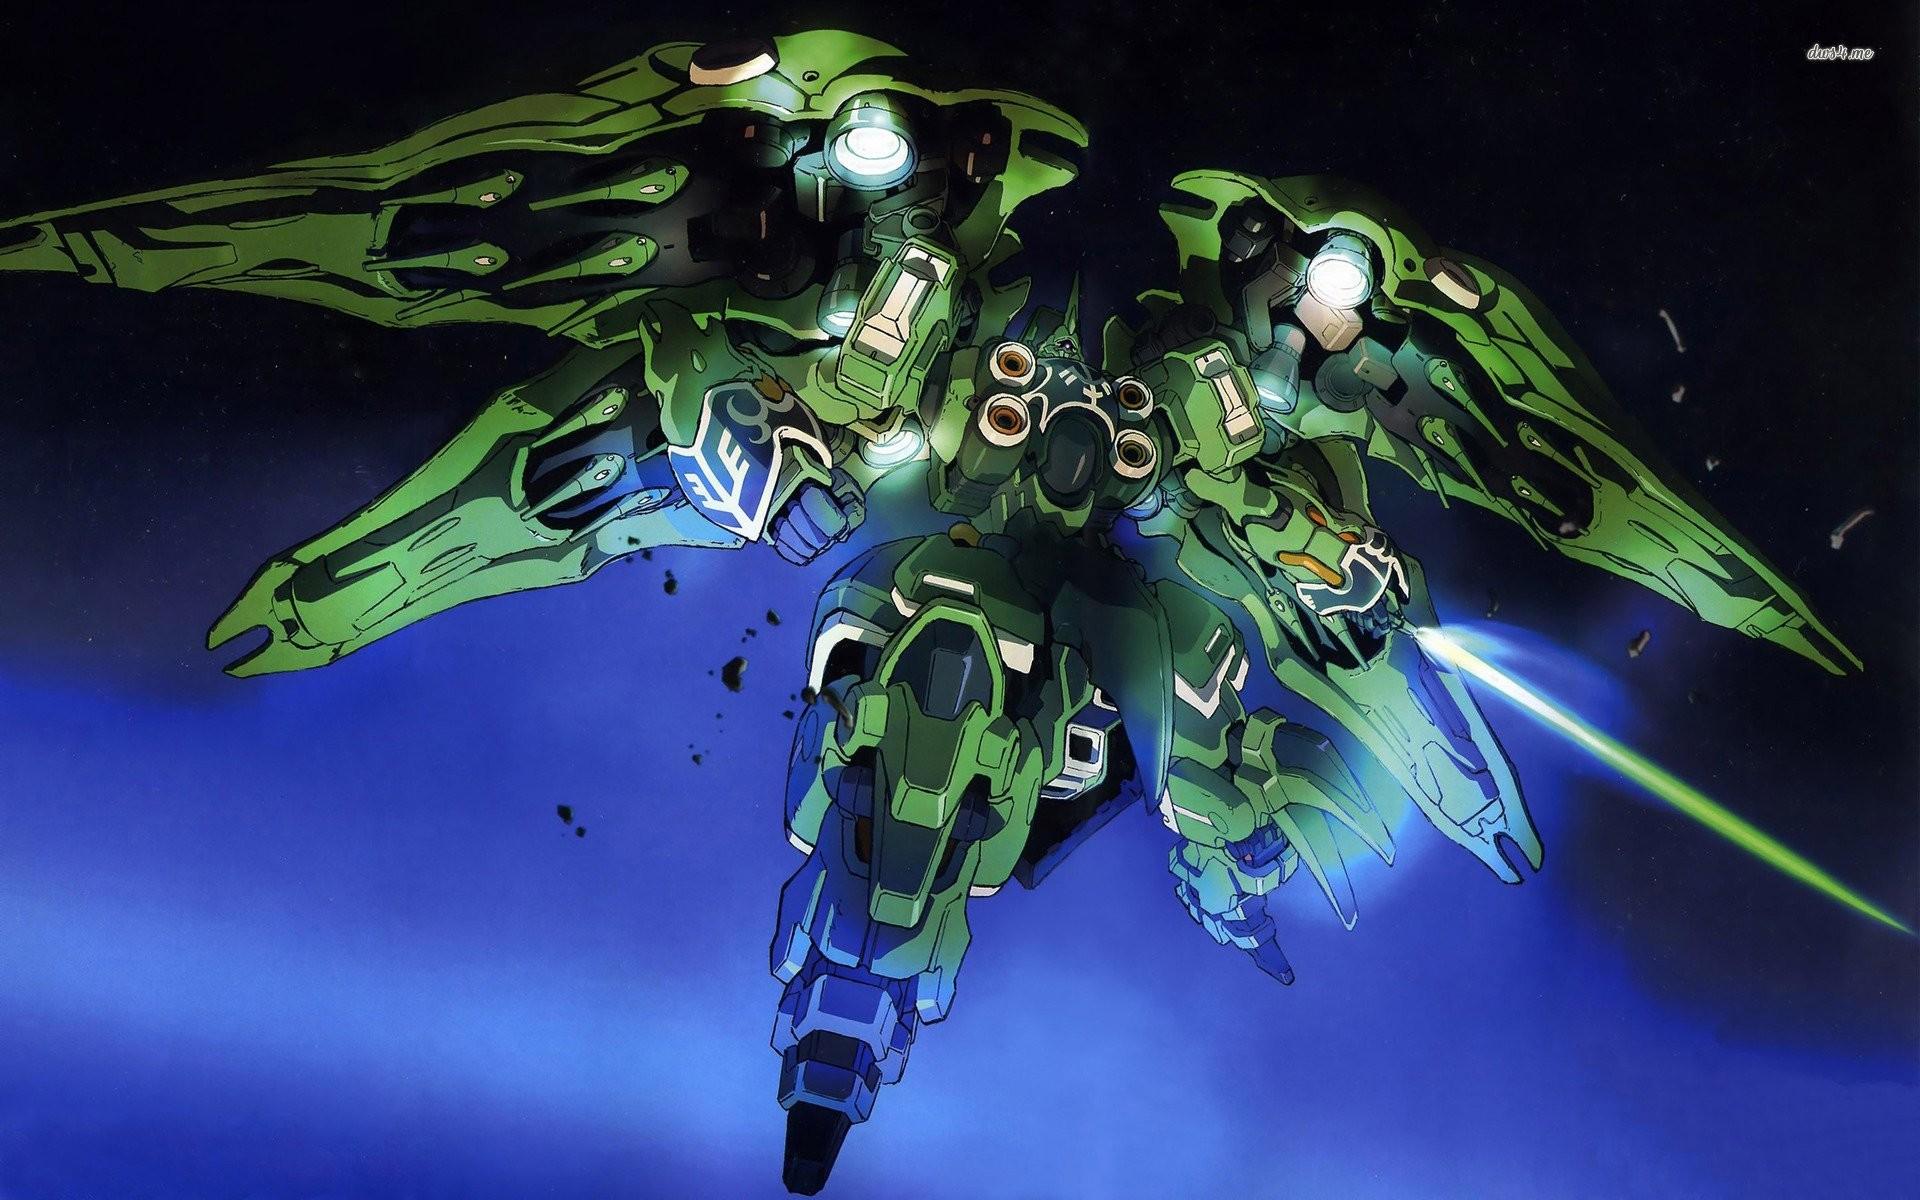 Gundam Unicorn Wallpaper Phone As Wallpaper HD